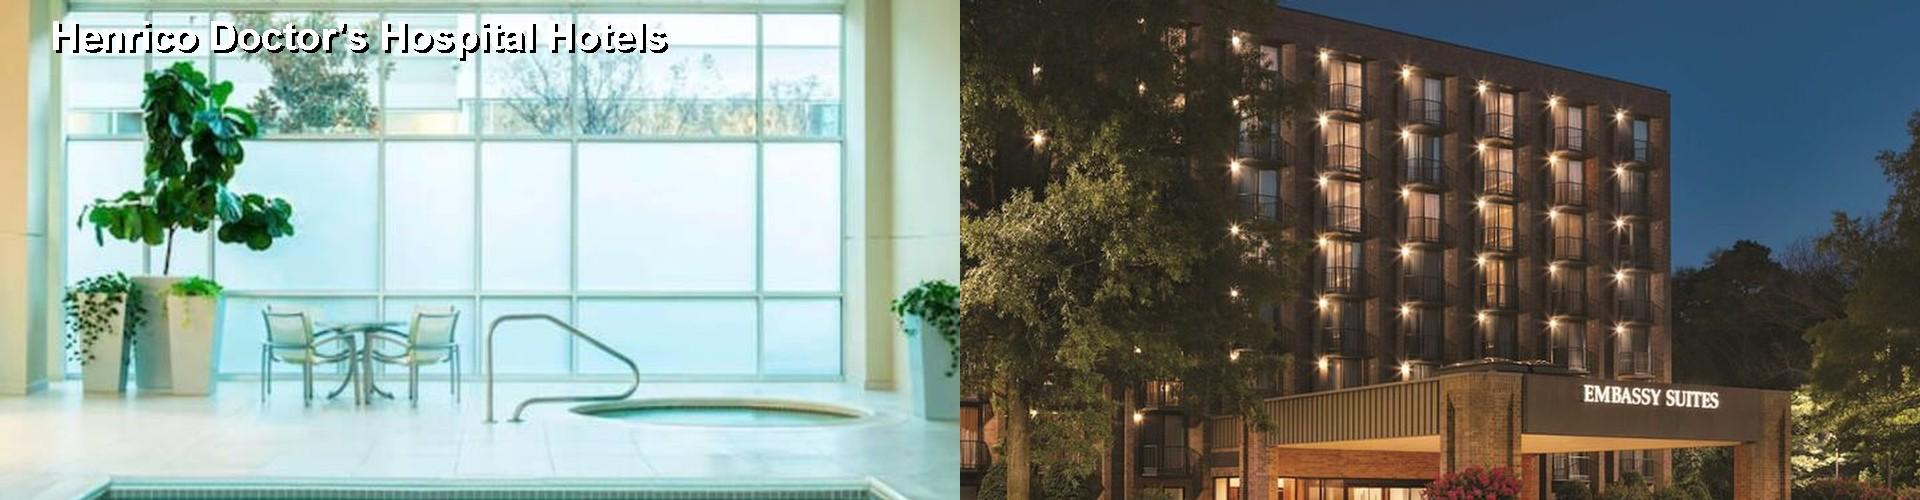 44 Hotels Near Henrico Doctor S Hospital In Richmond Va